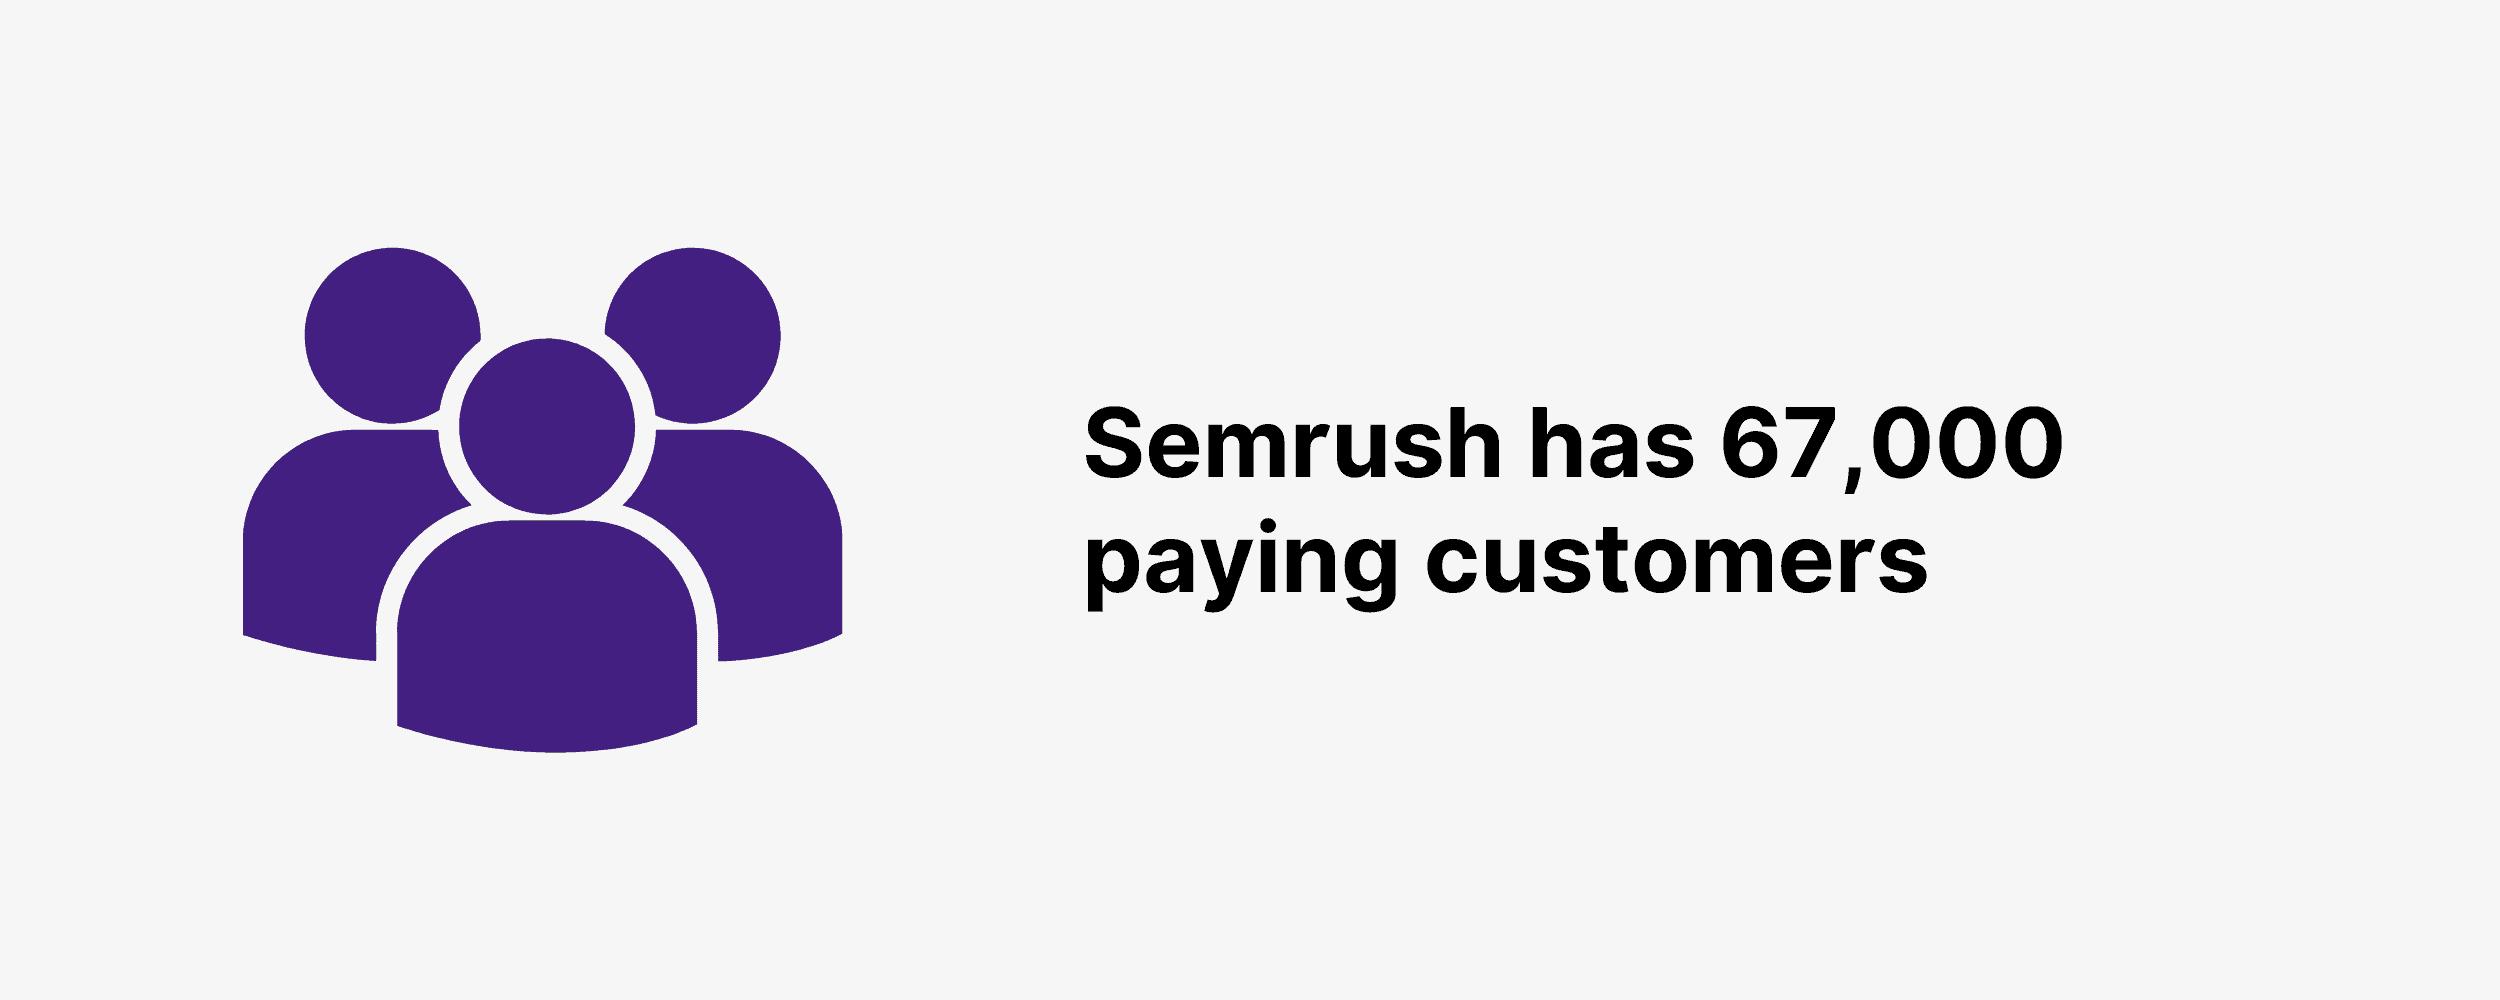 Semrush has 67,000 paying customers